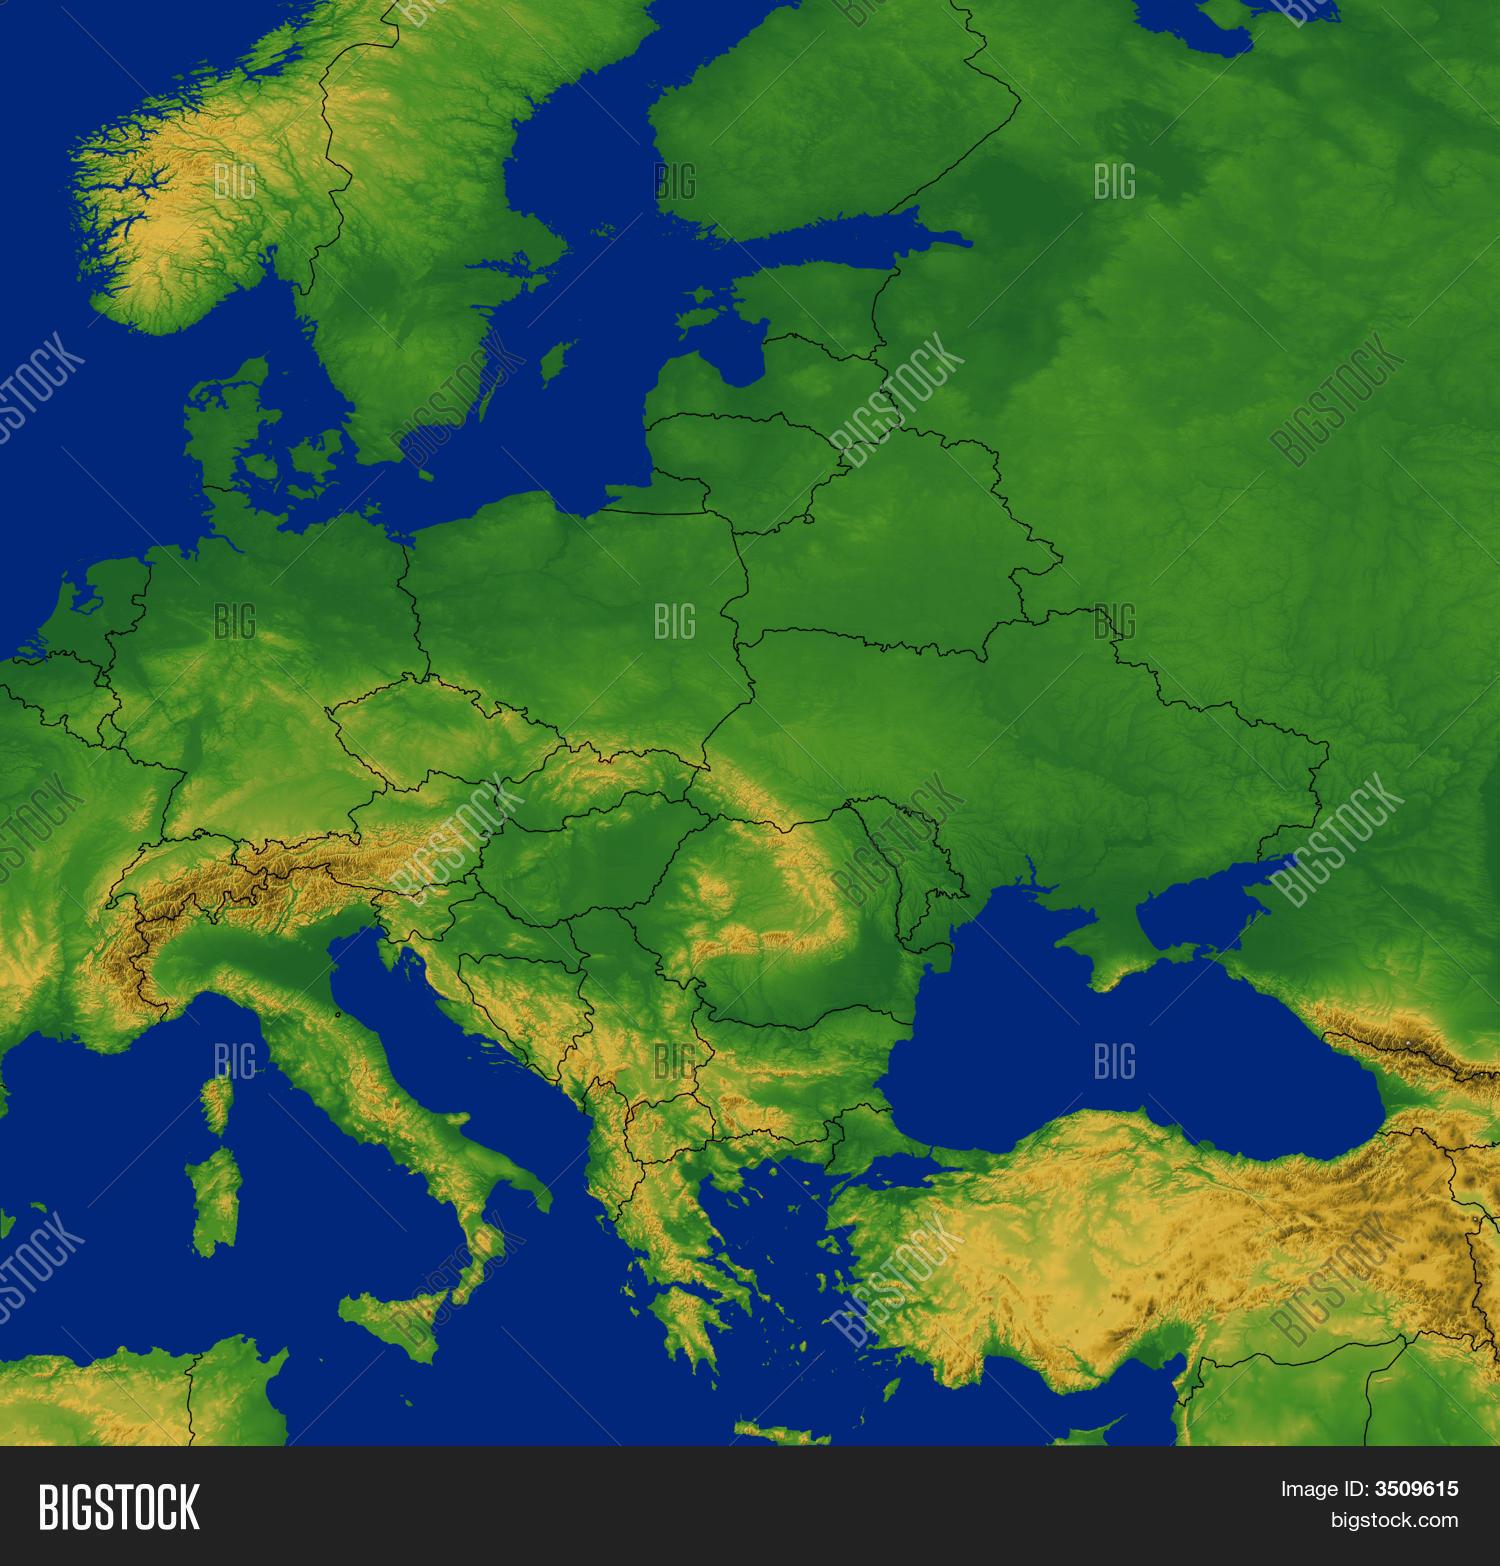 Europe Map Terrain Image & Photo (Free Trial)   Bigstock